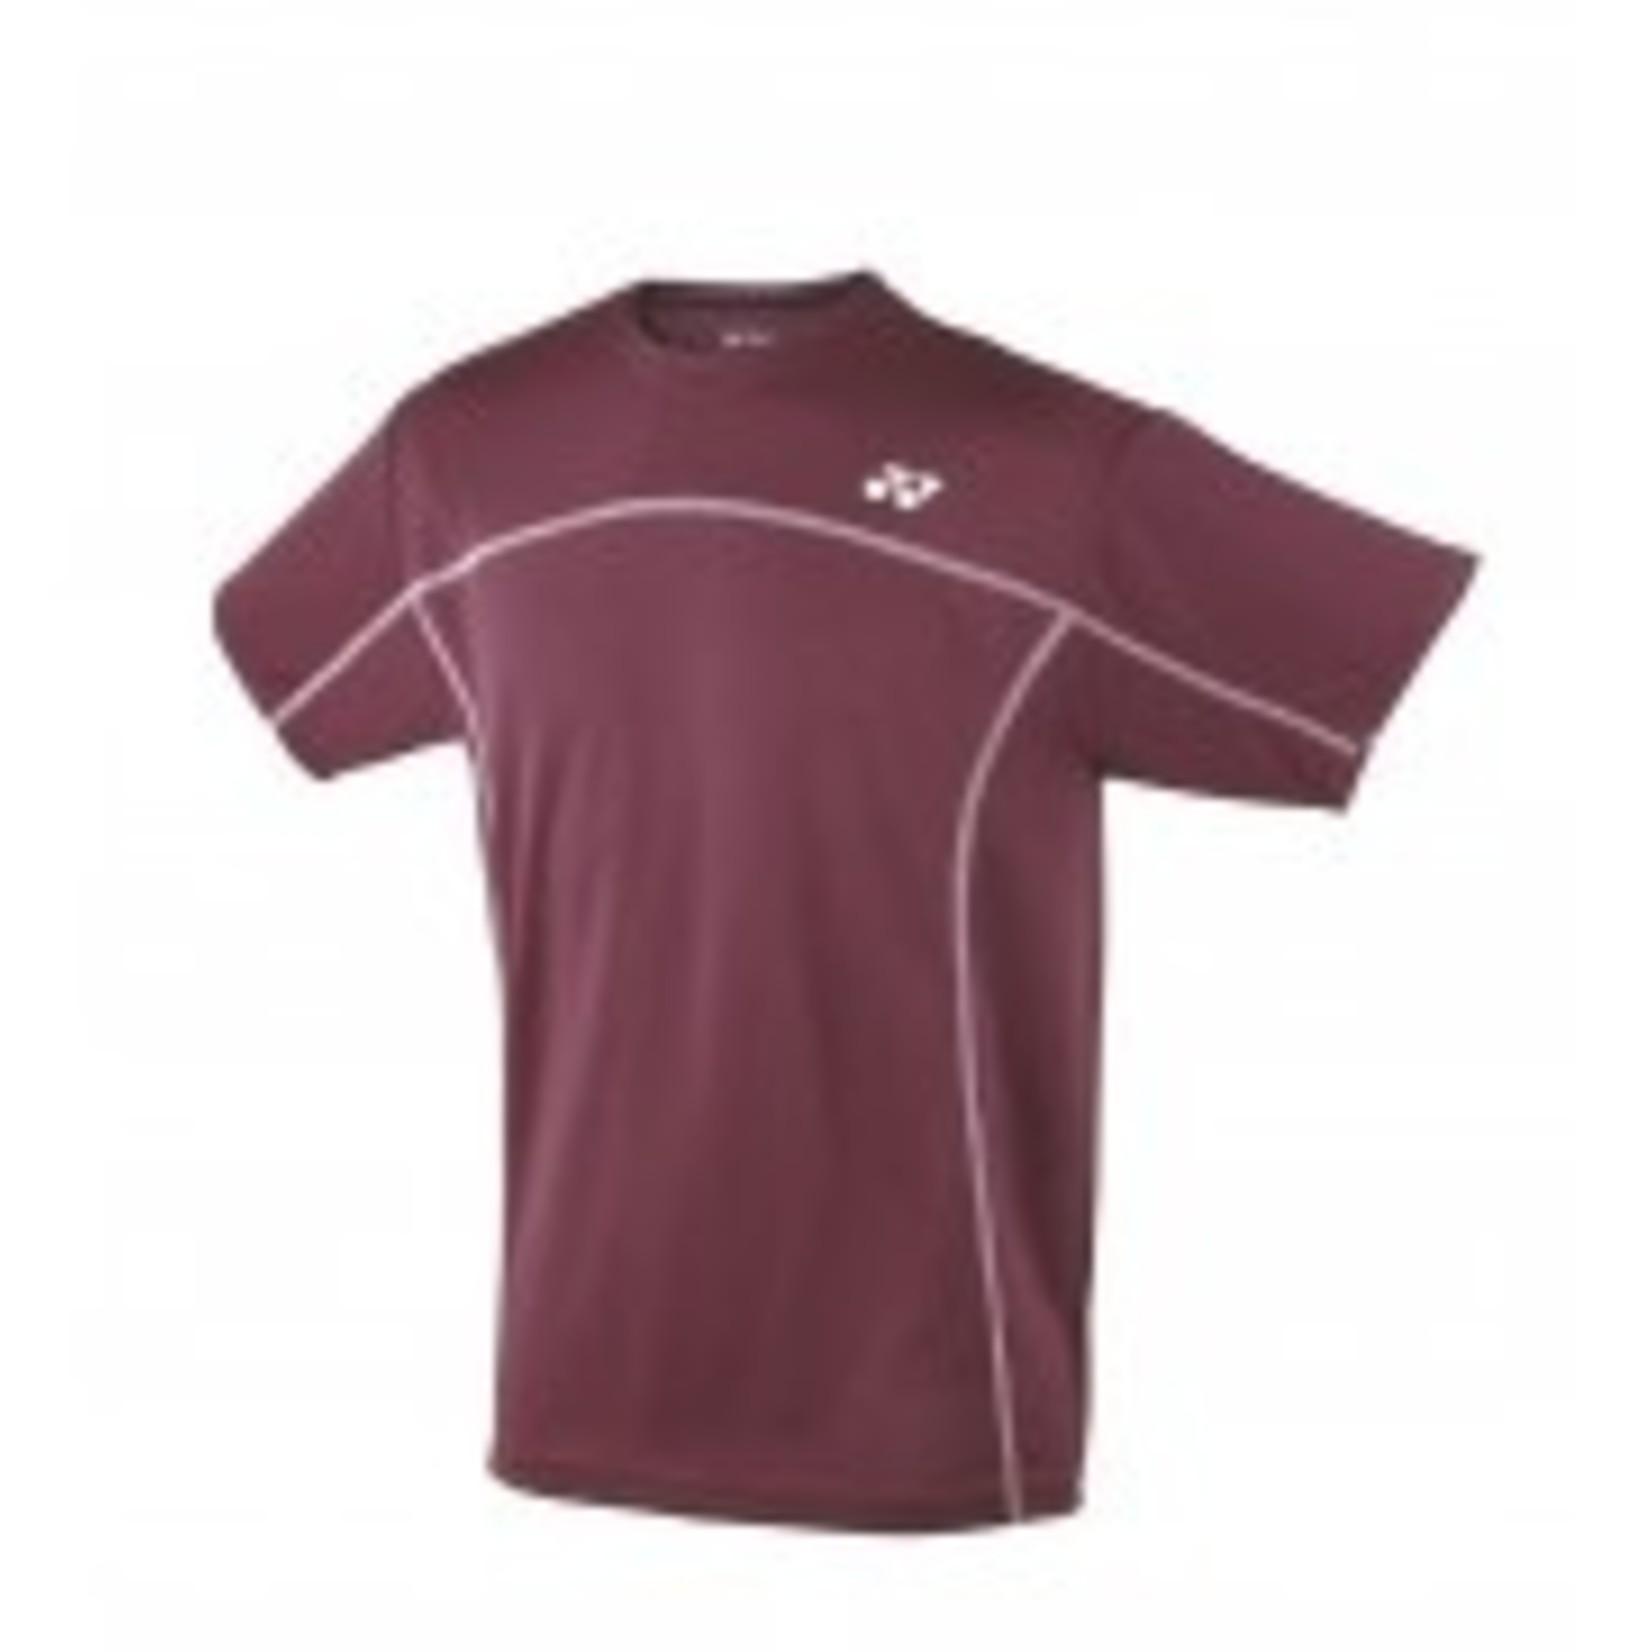 Yonex Yonex shirt YTM1